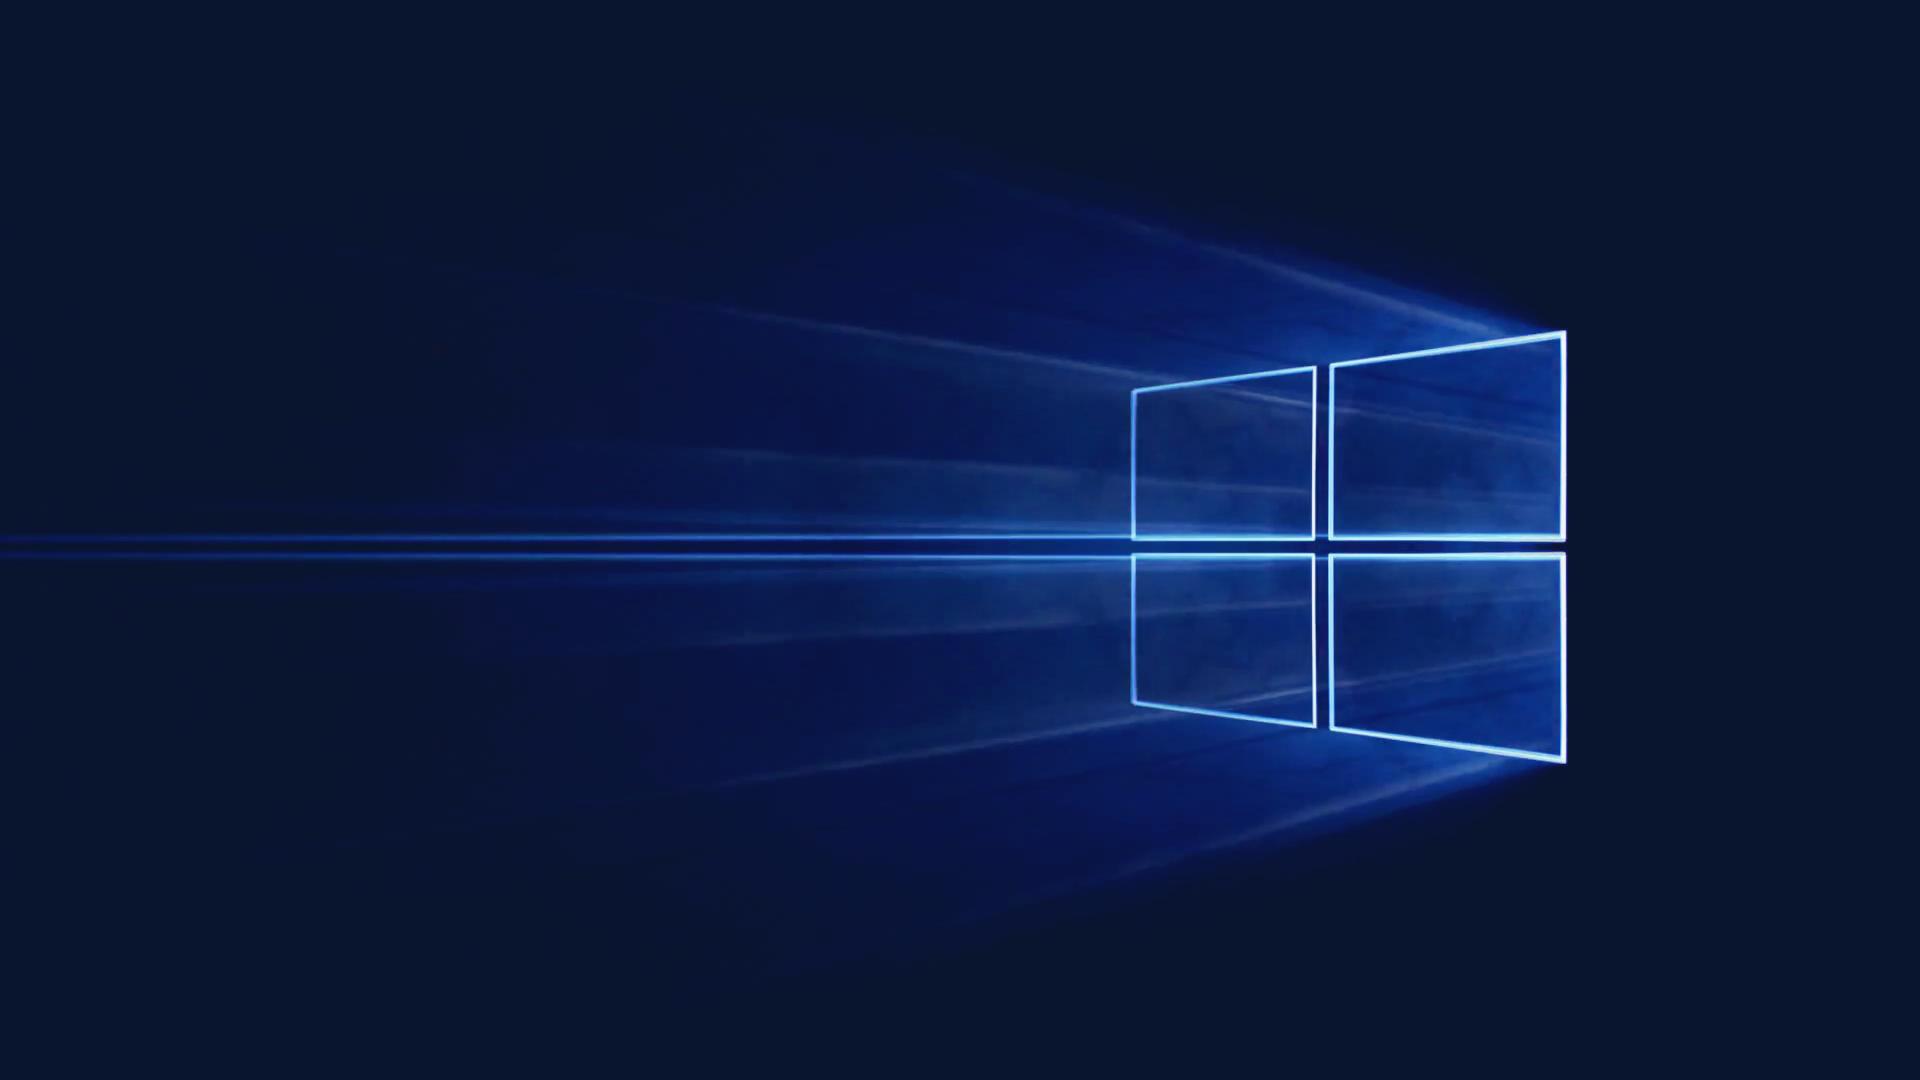 100+ Stunning Windows 10 wallpaper for PC